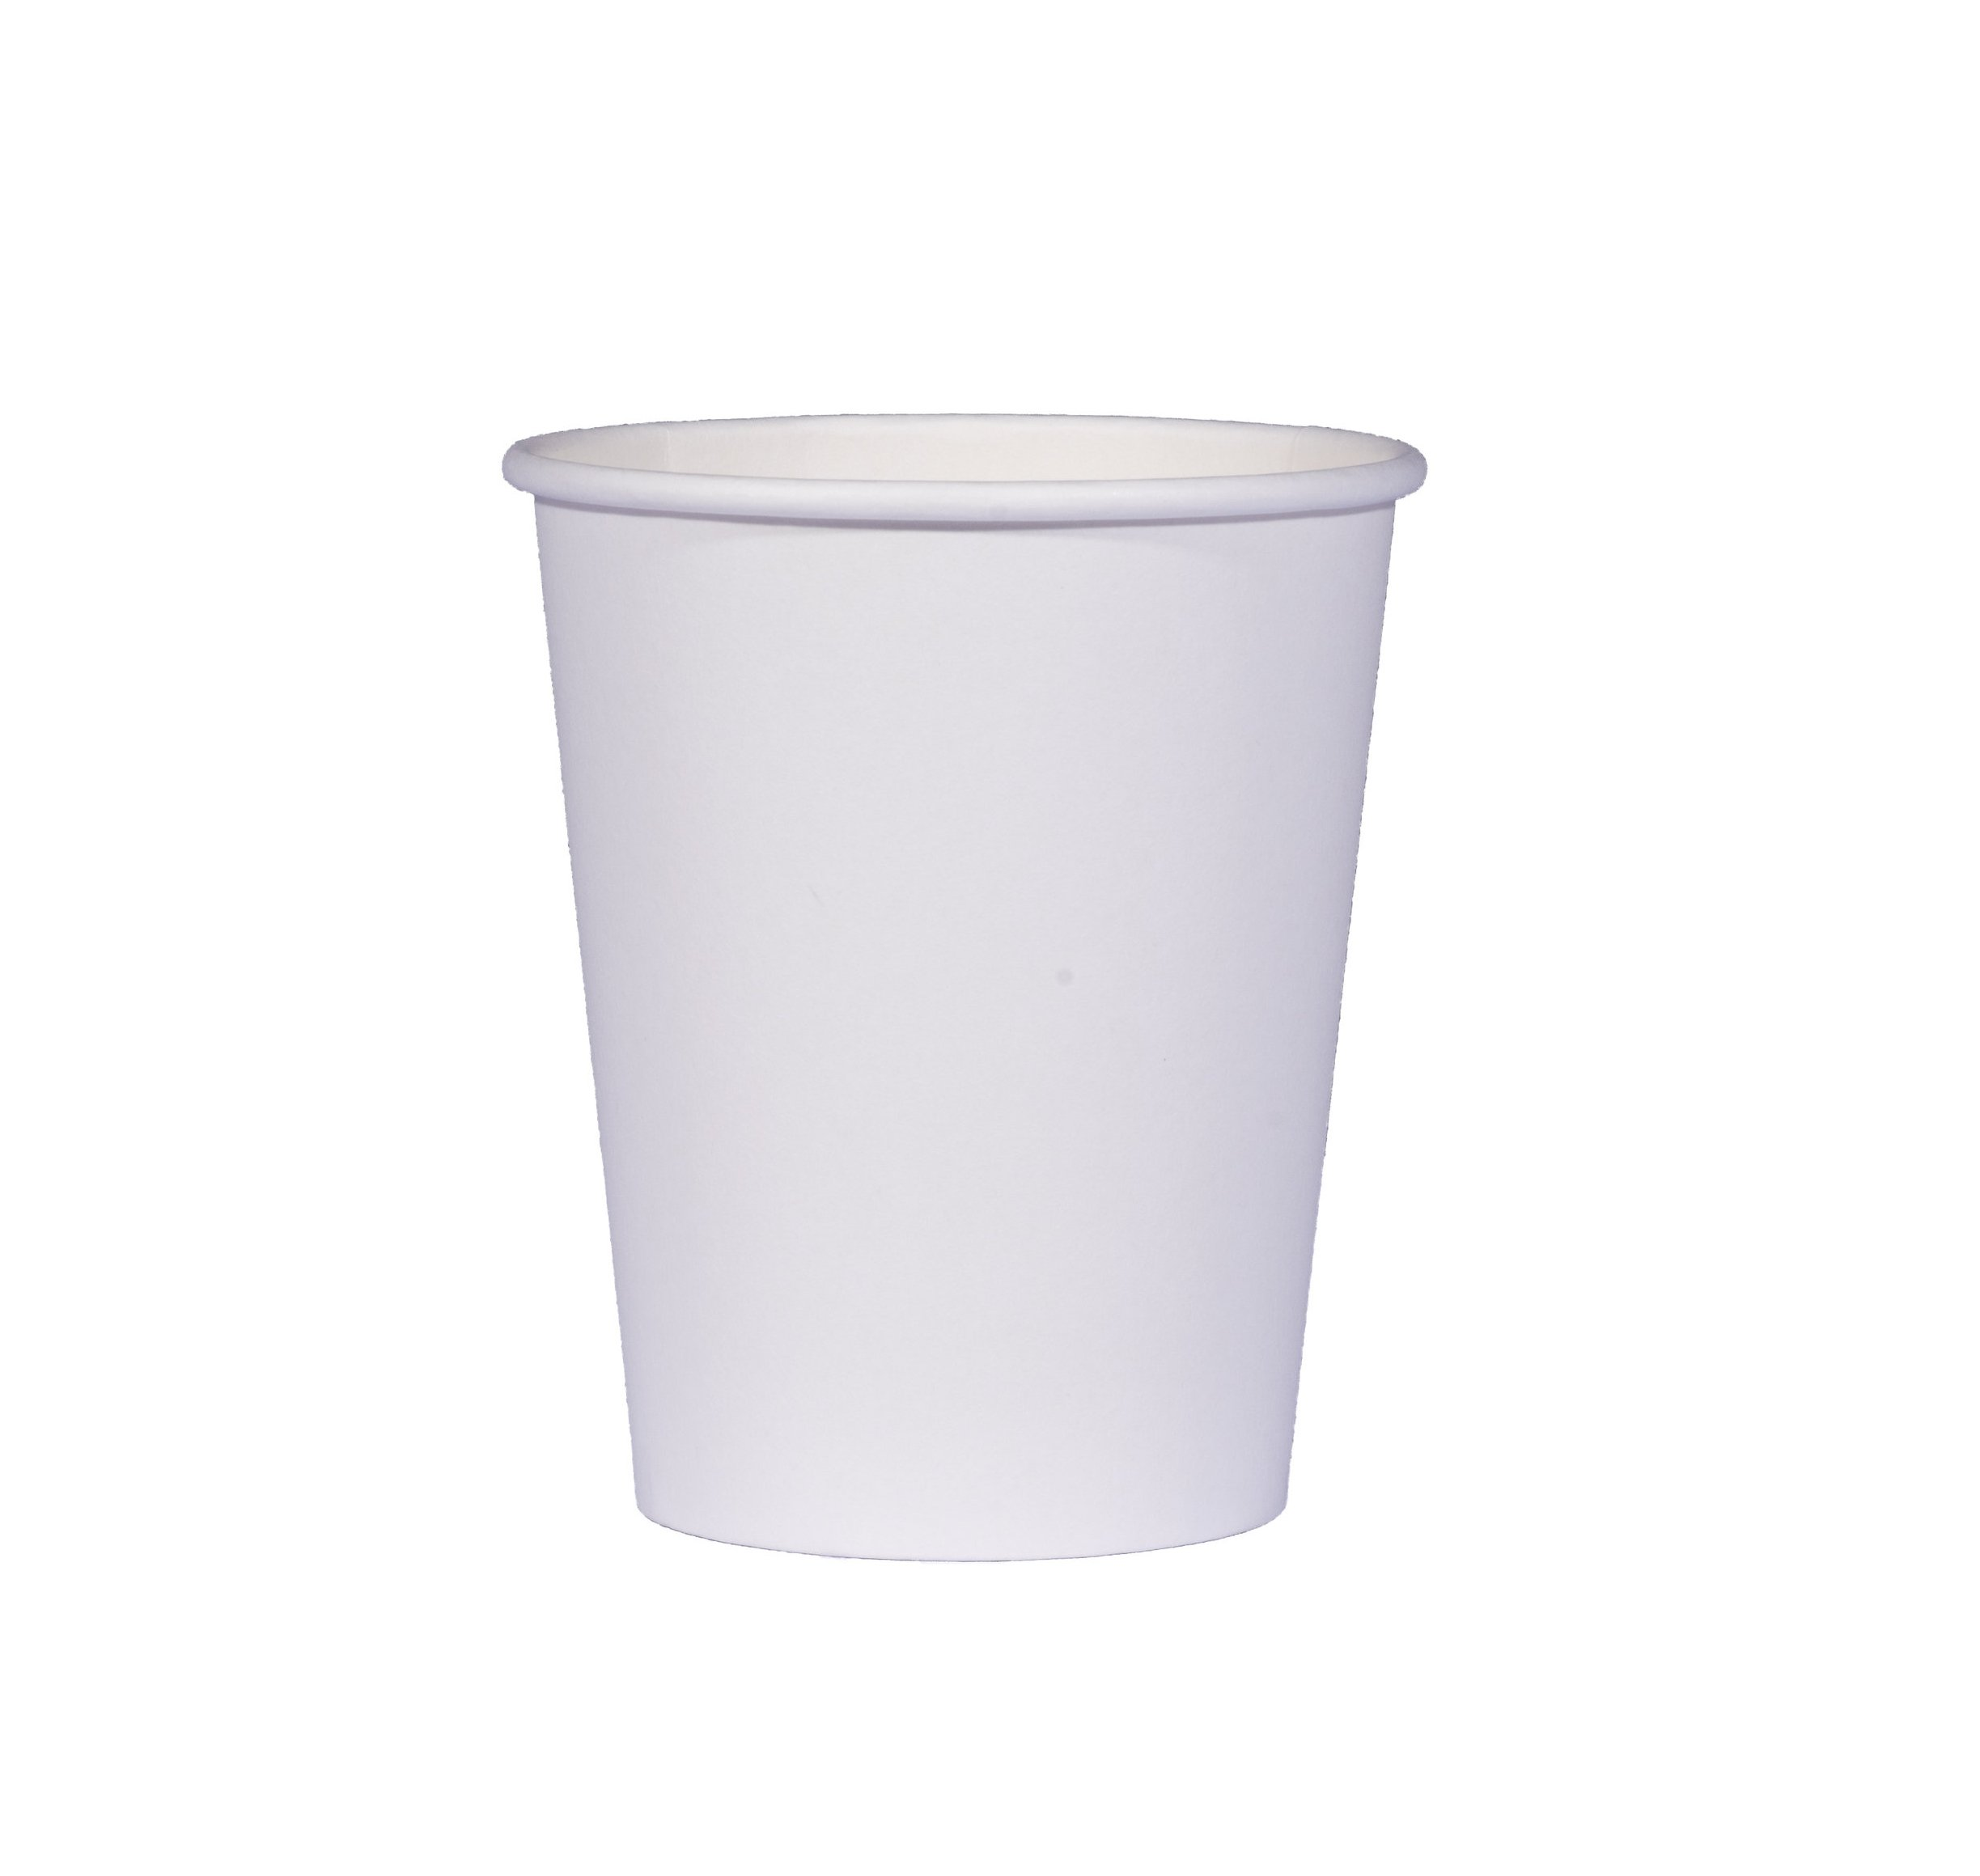 TashiBox 8 oz White Hot Drink Paper Cups - 150 Count - Coffee, Tea, Hot Cocoa by TashiBox (Image #2)